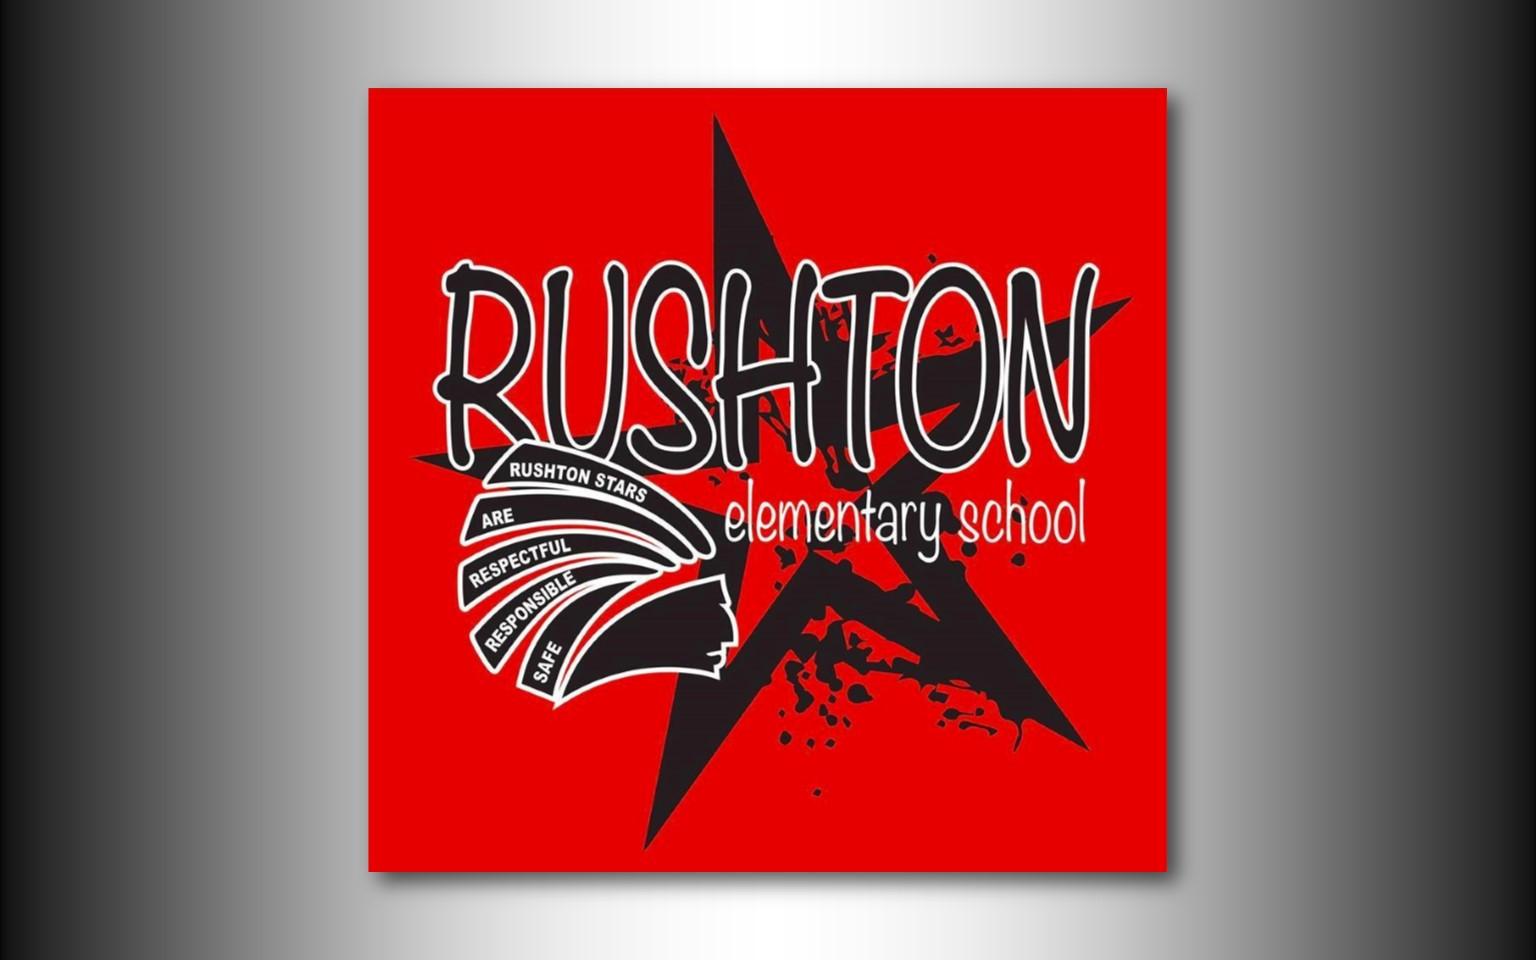 Rushton Elementary School